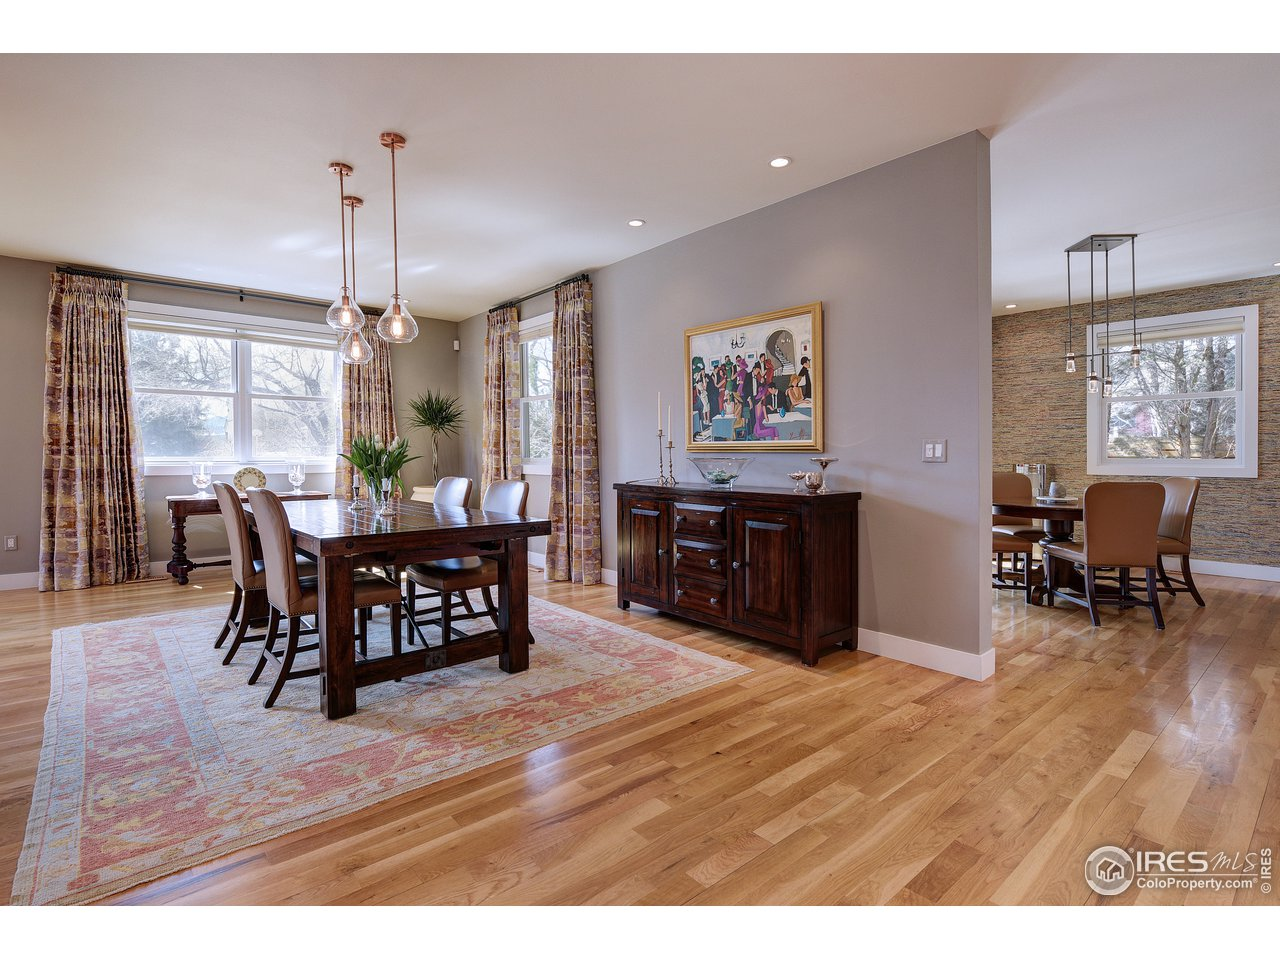 Hardwood oak flooring throughout main level